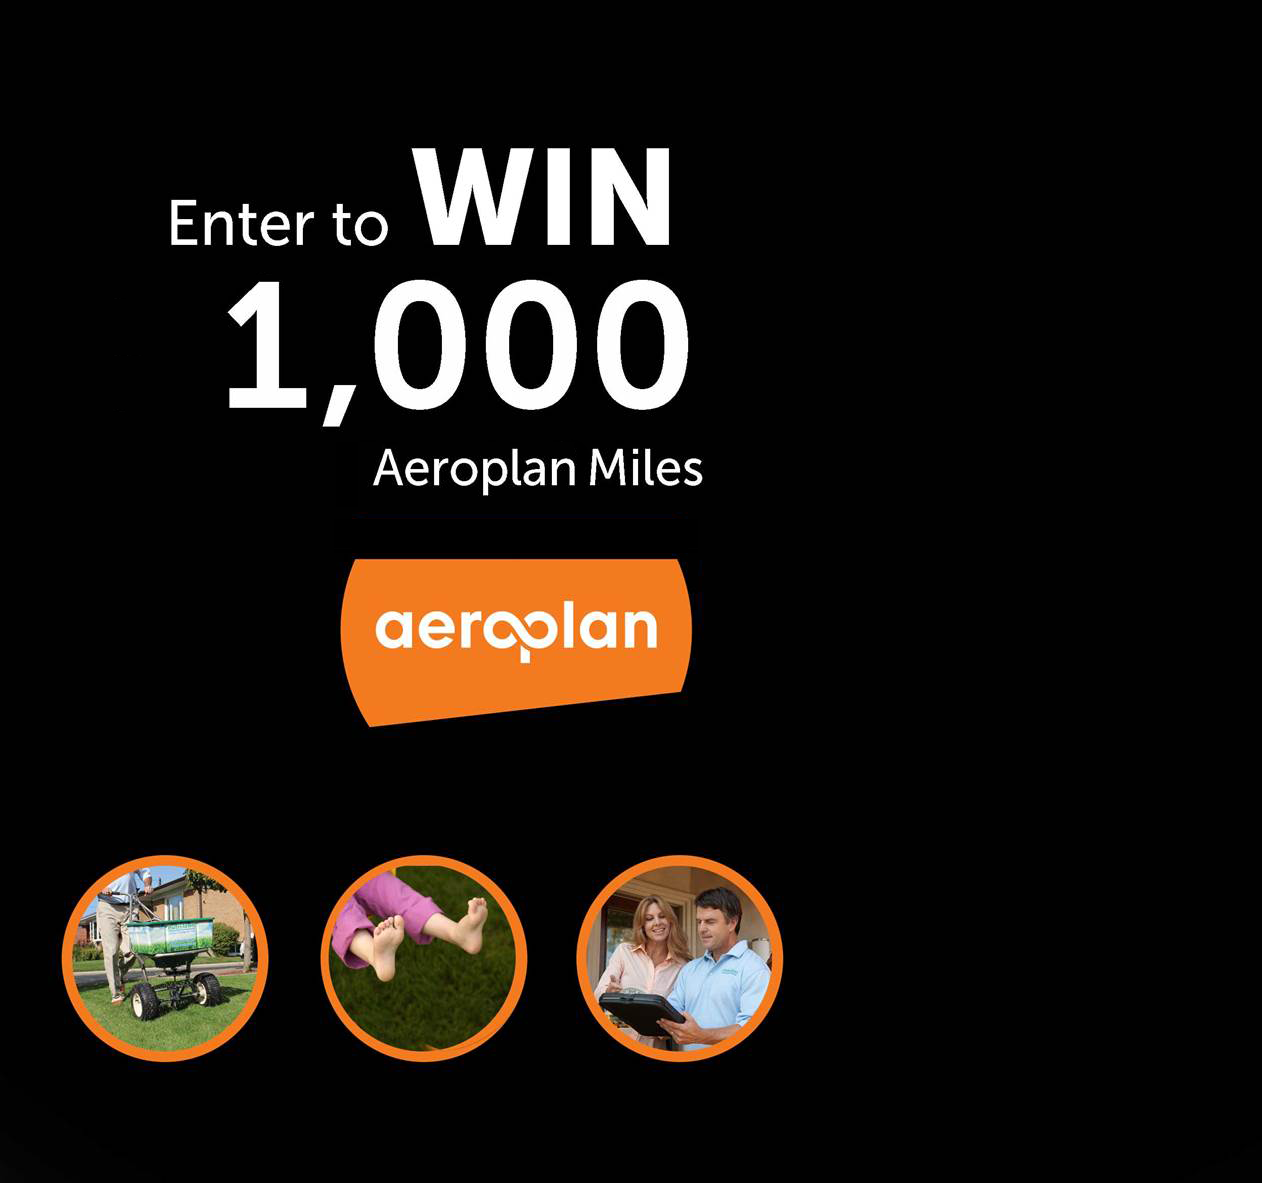 how to buy aeroplan miles